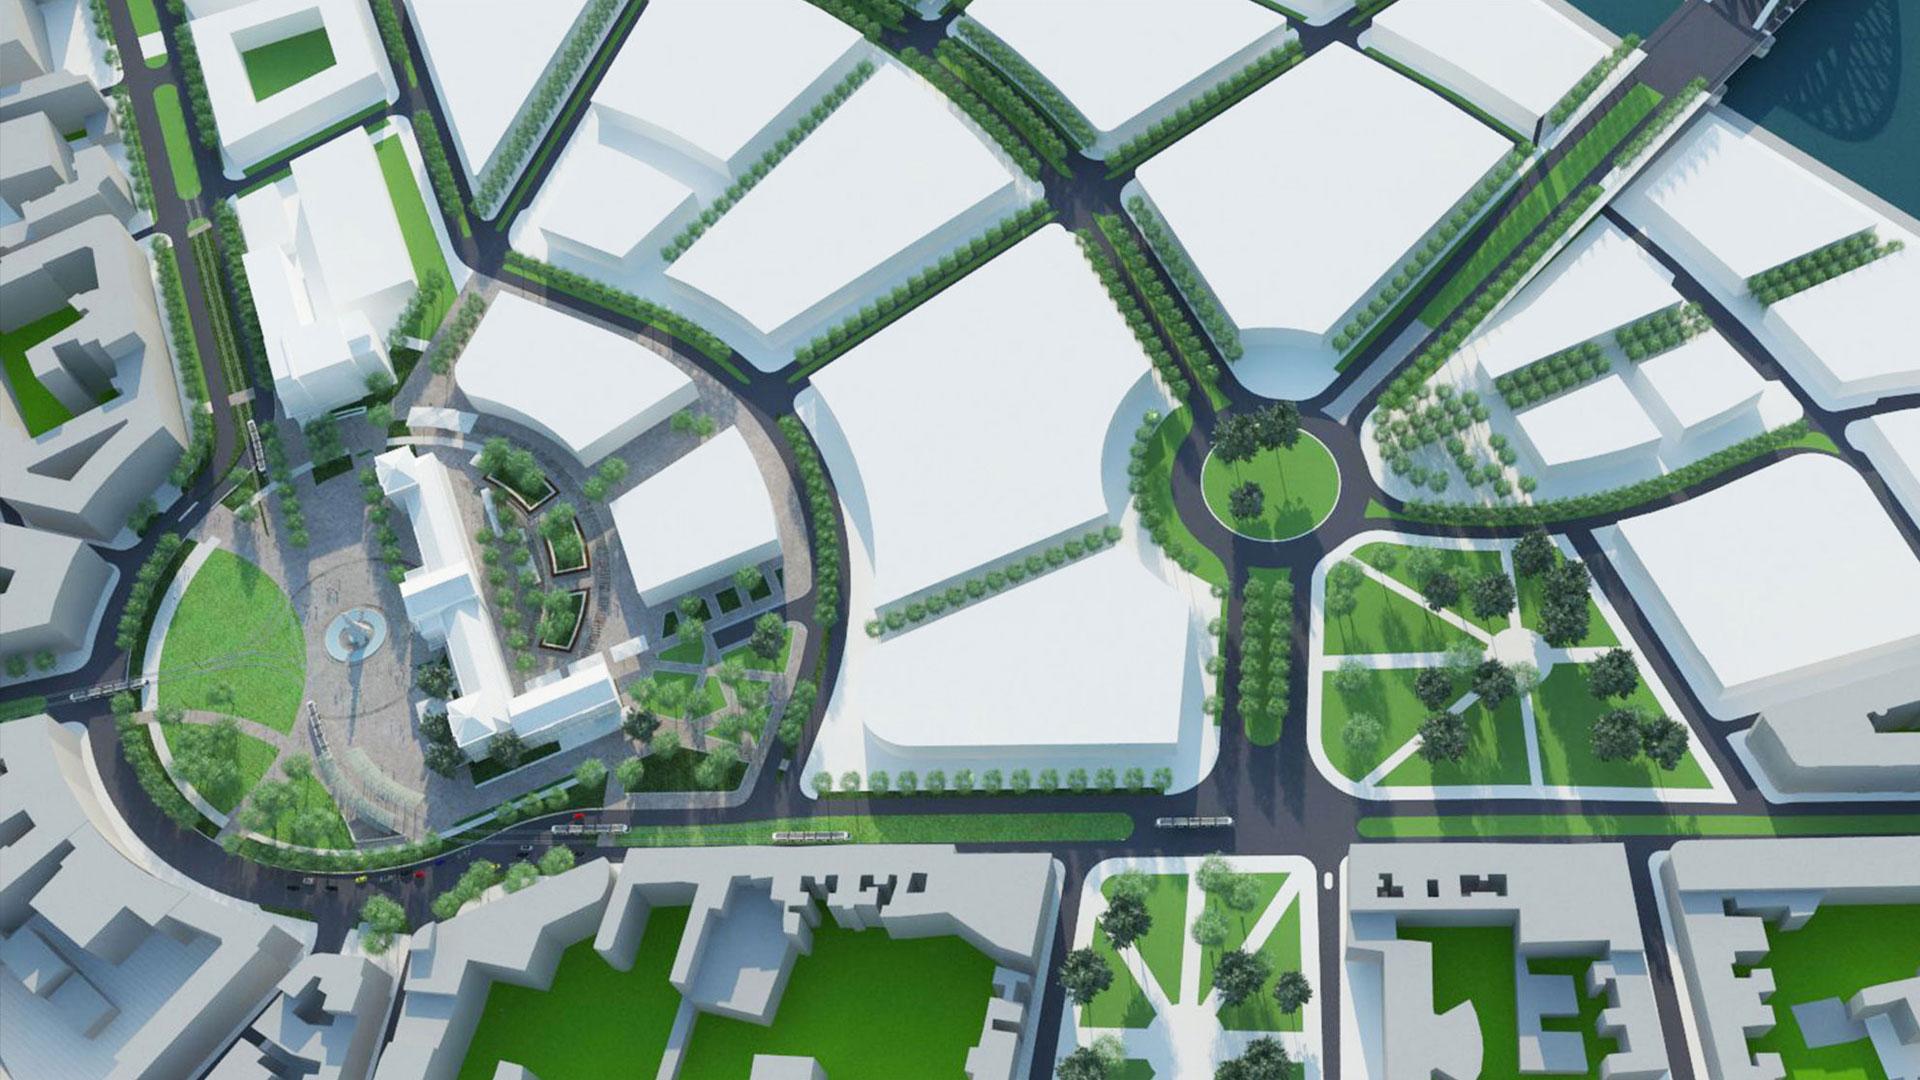 Savski trg Beograd, landscape, urbanism, urbanizam, natječaj, konkurs, krajobrazna arhitektura, Željko Radišić